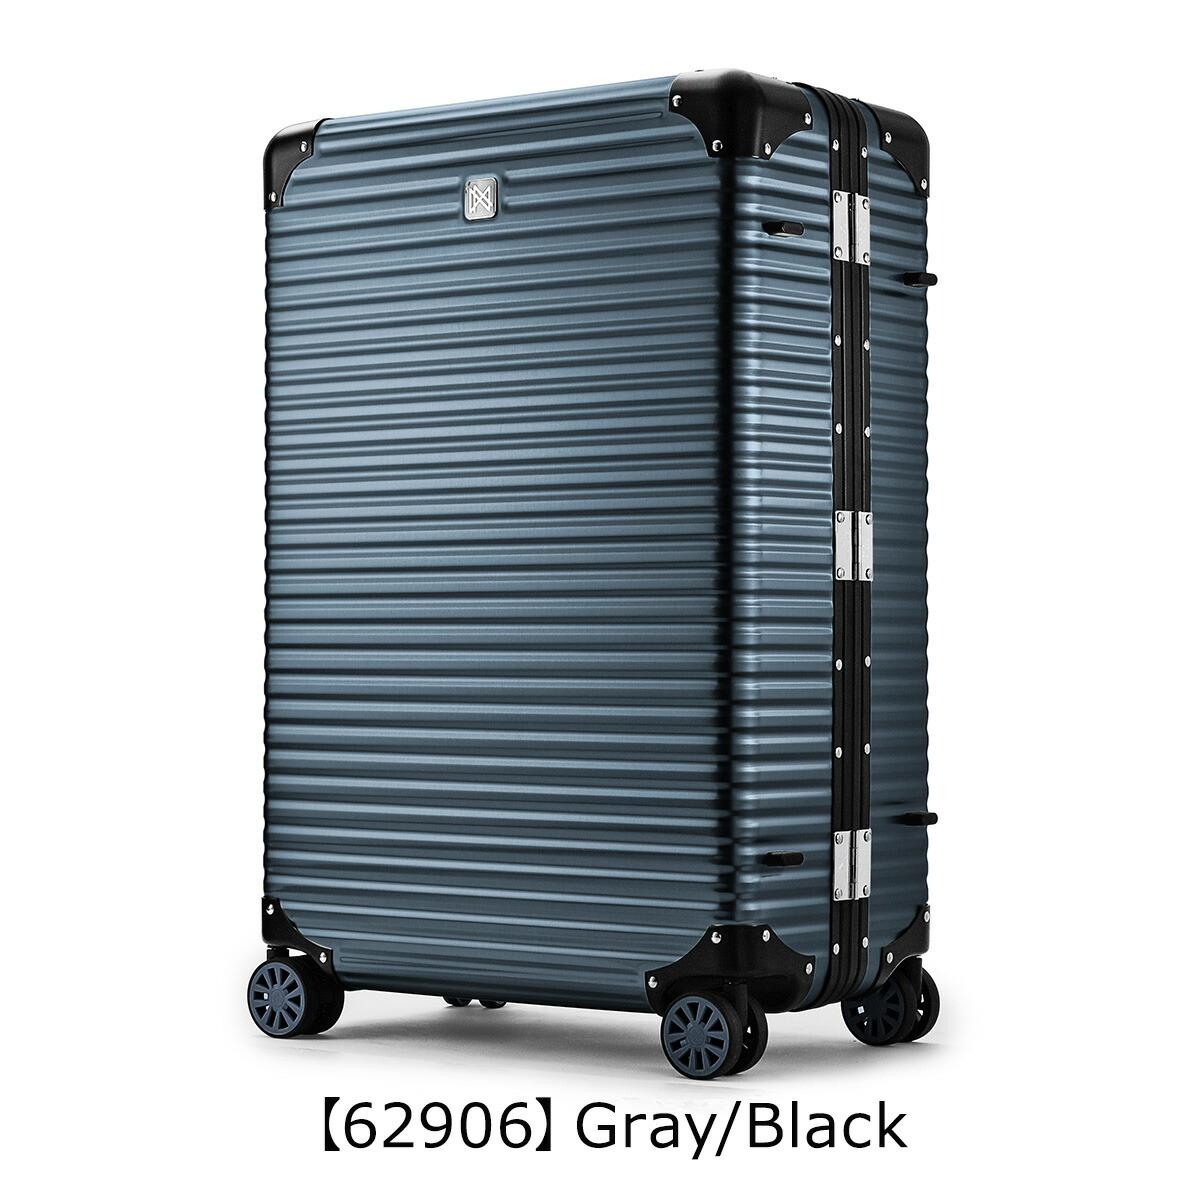 【62906】Gray/Black